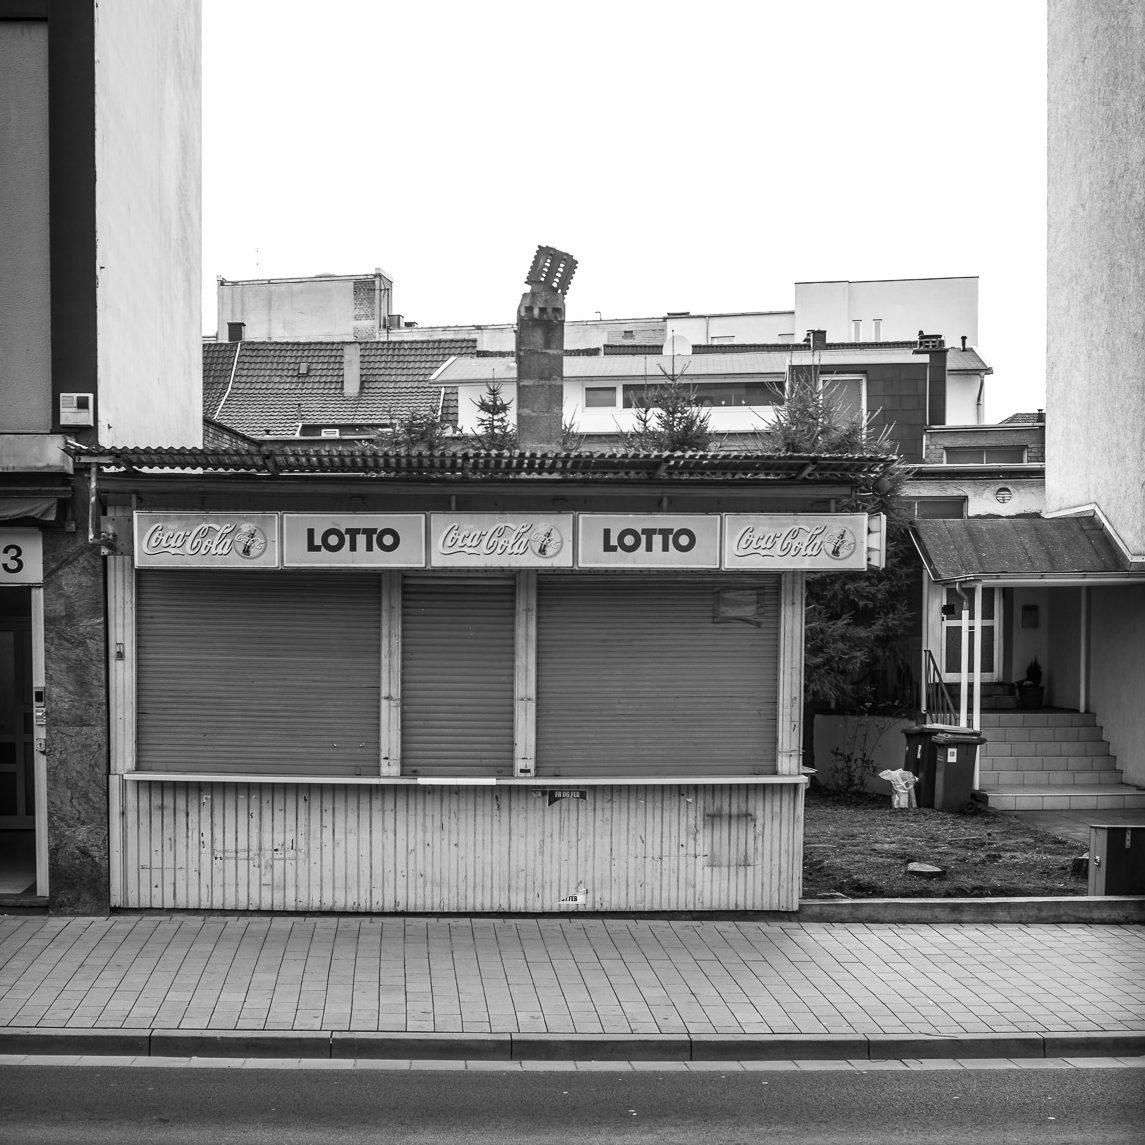 Kiosk #3